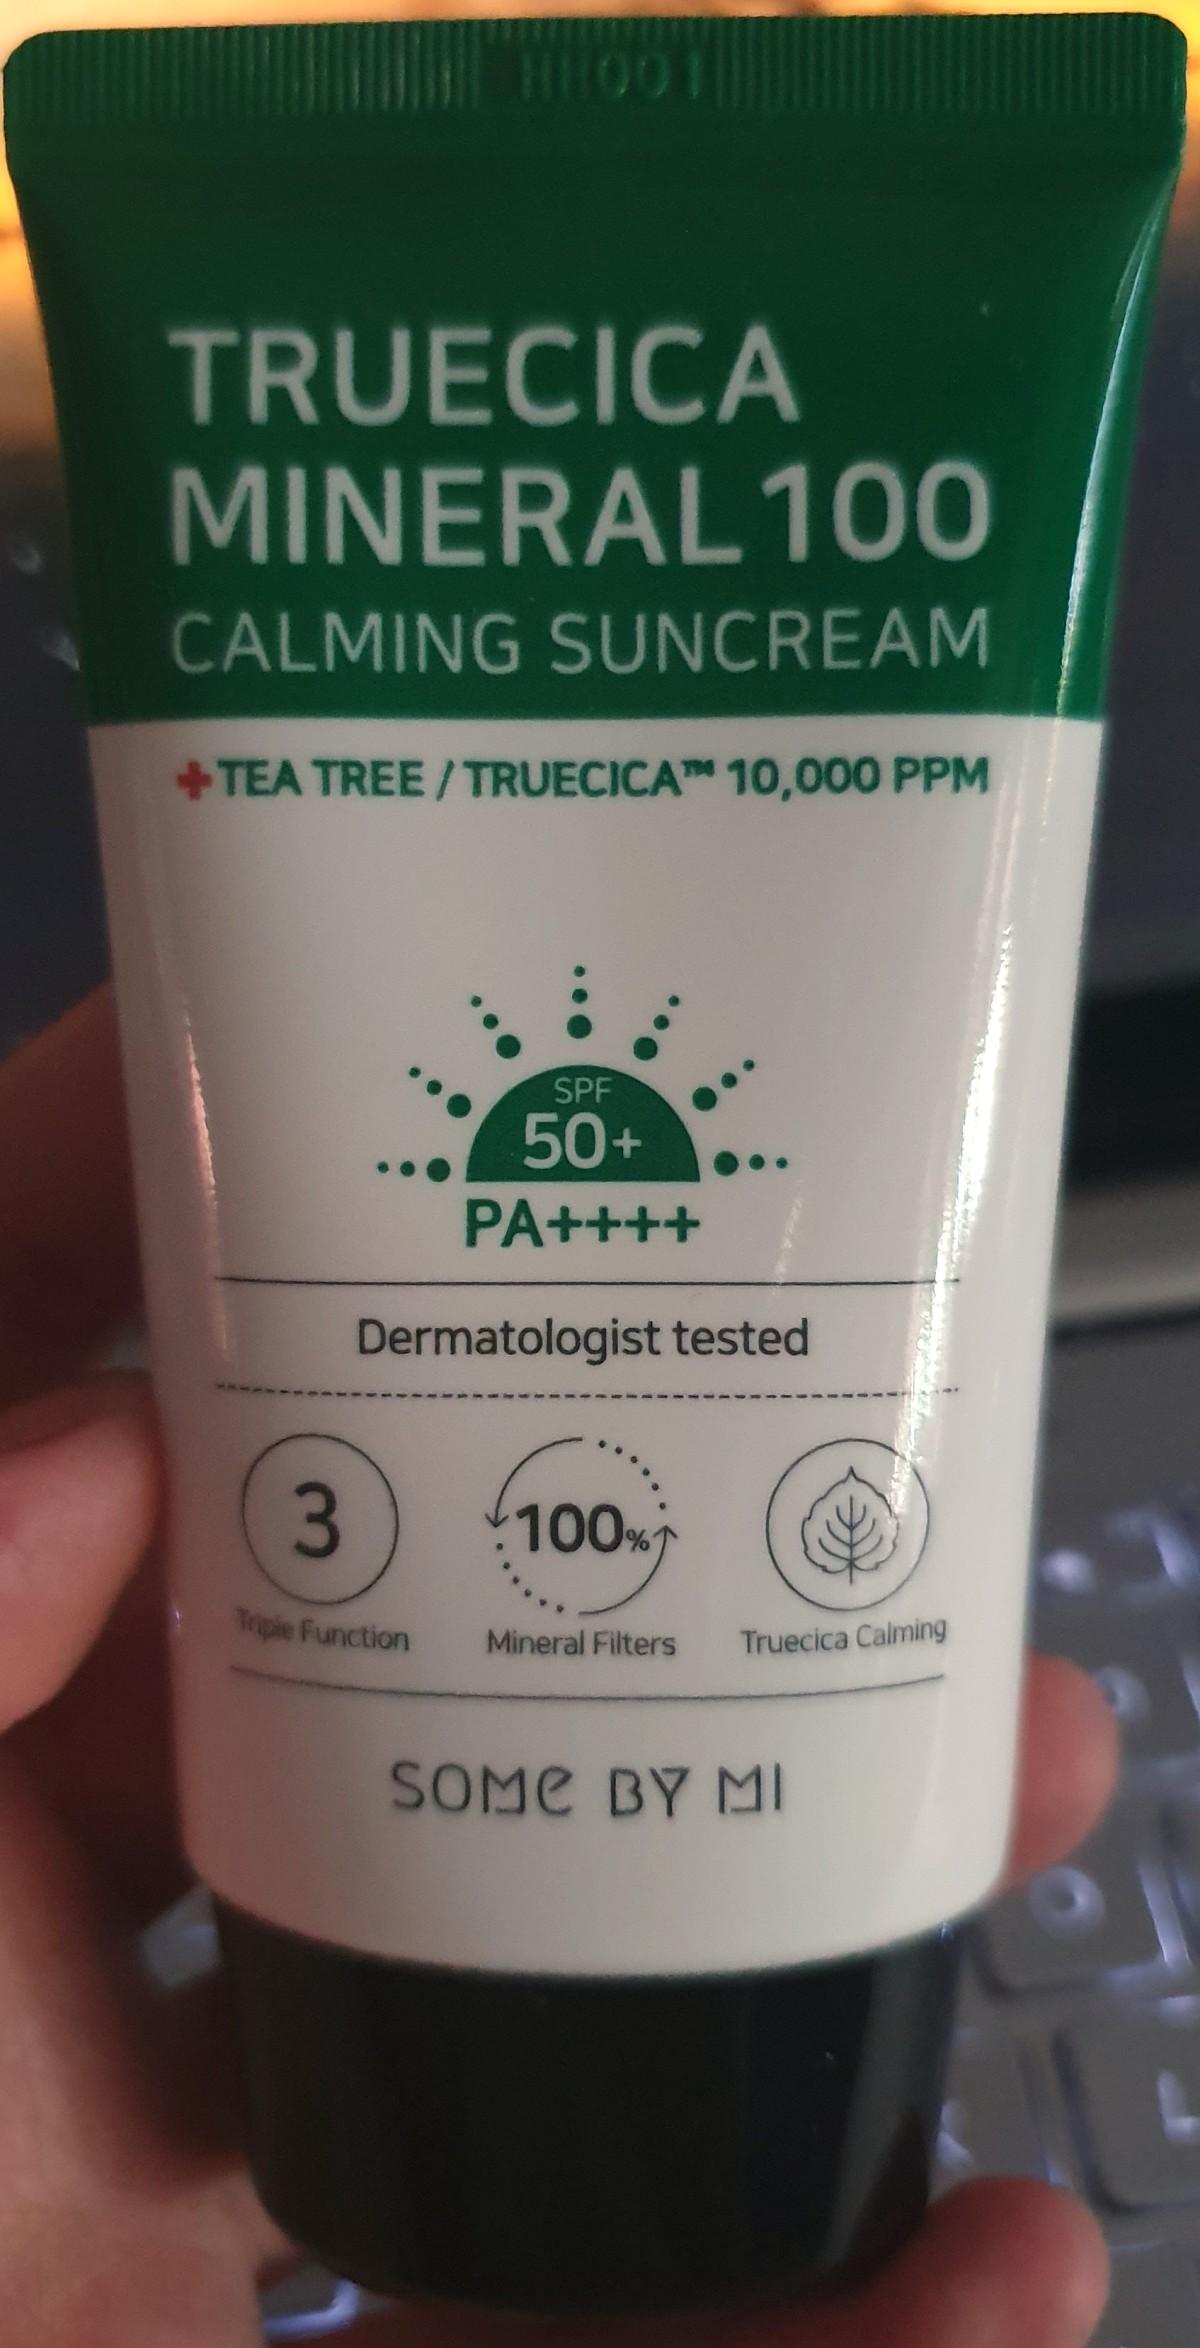 Truecica Mineral 100 Calming Suncream SPF50+ PA++++  – Some byMi